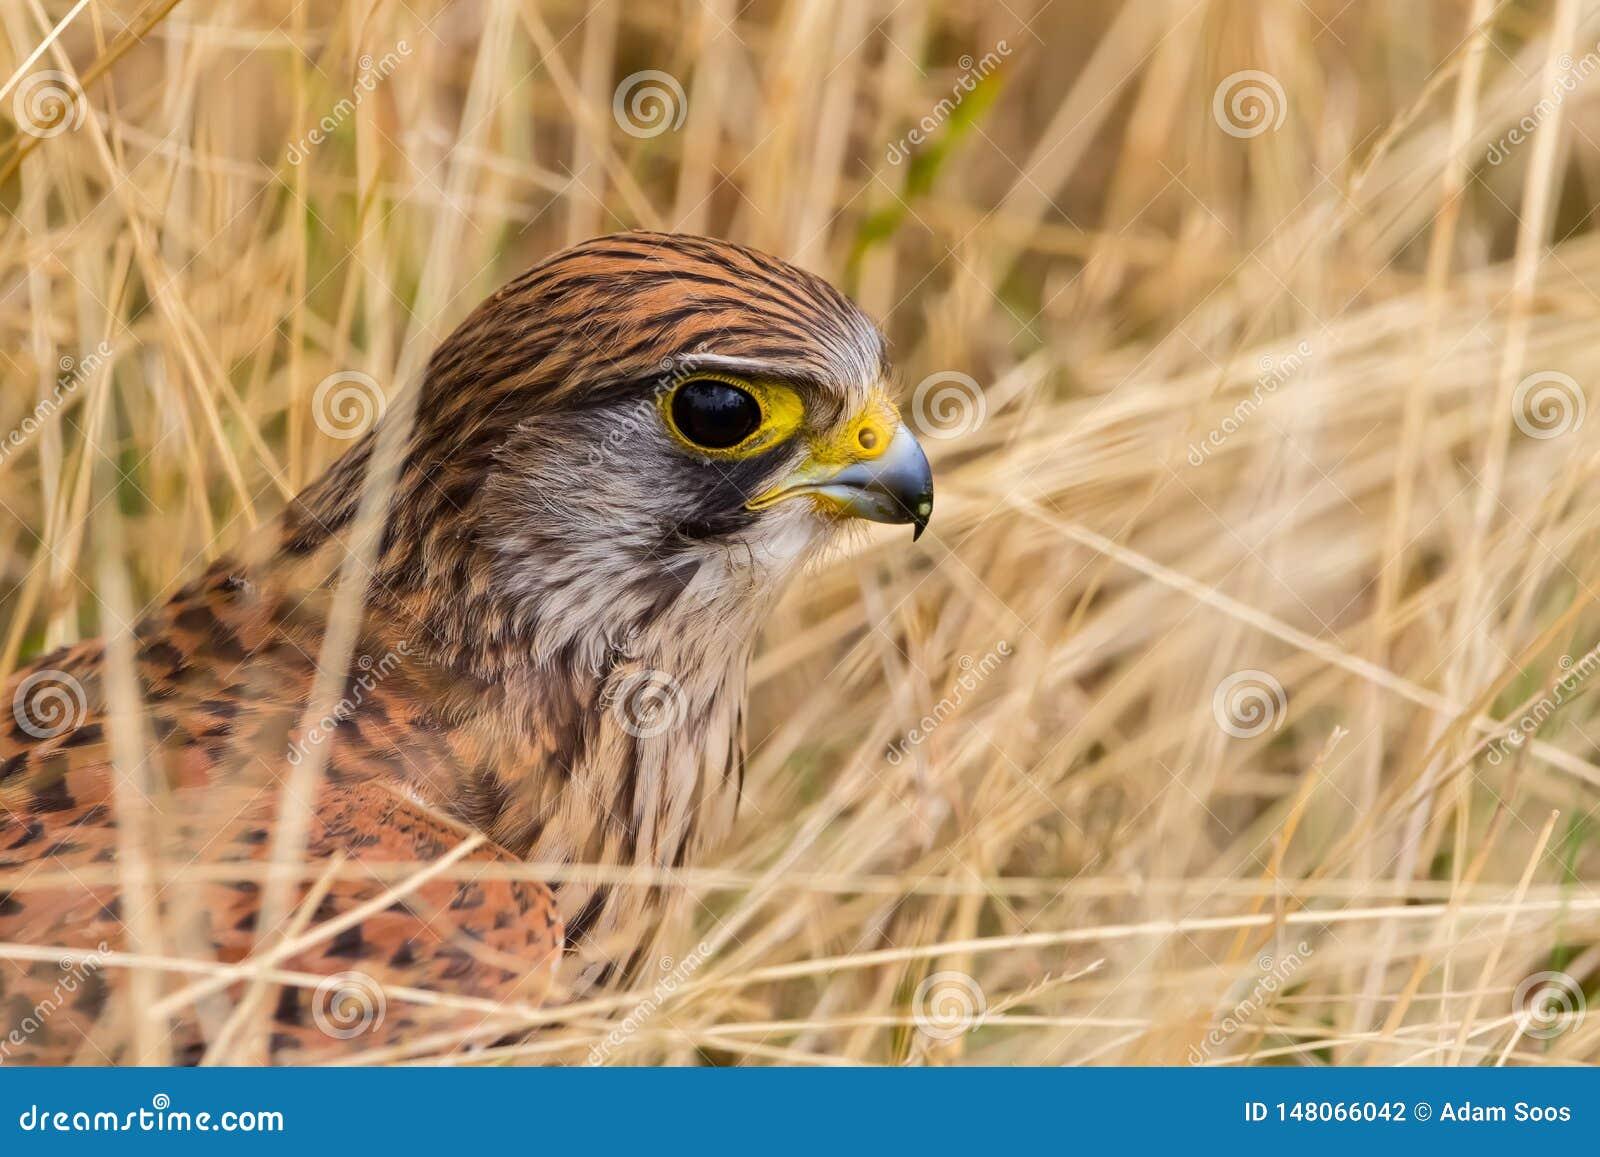 Gemeiner Kestrel, Falco tinnunculus